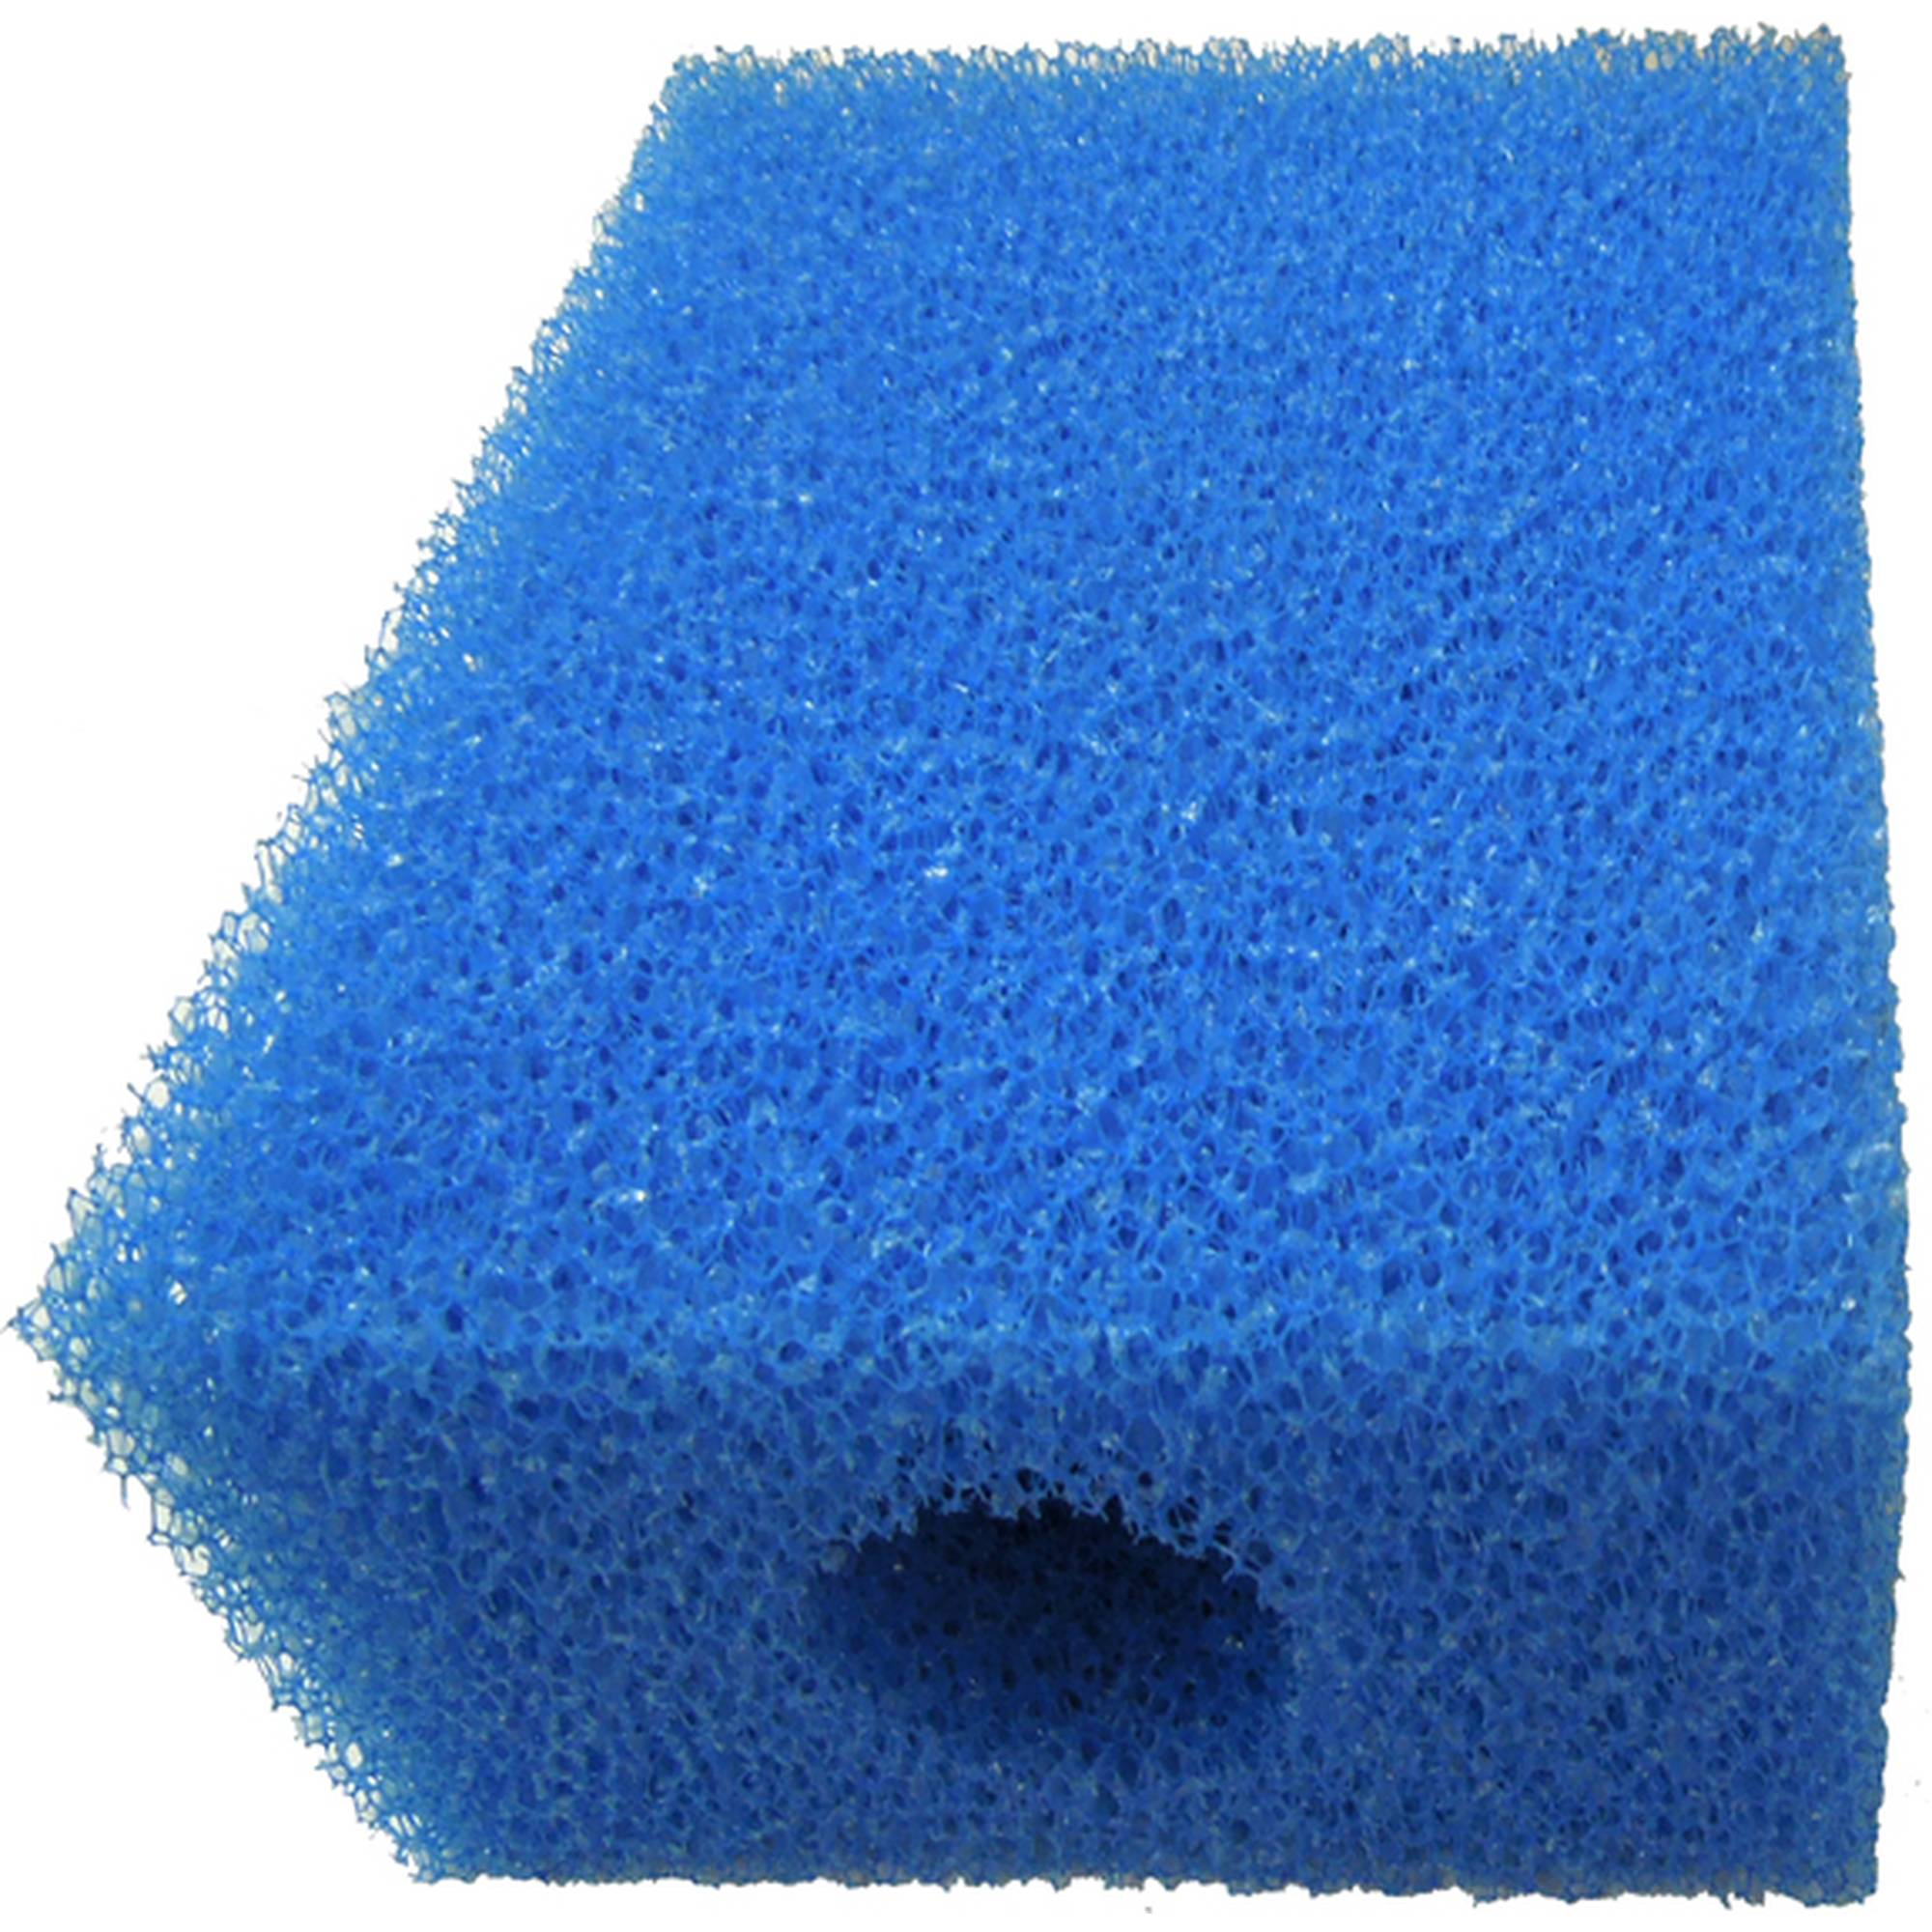 Filterschwamm blau, grob